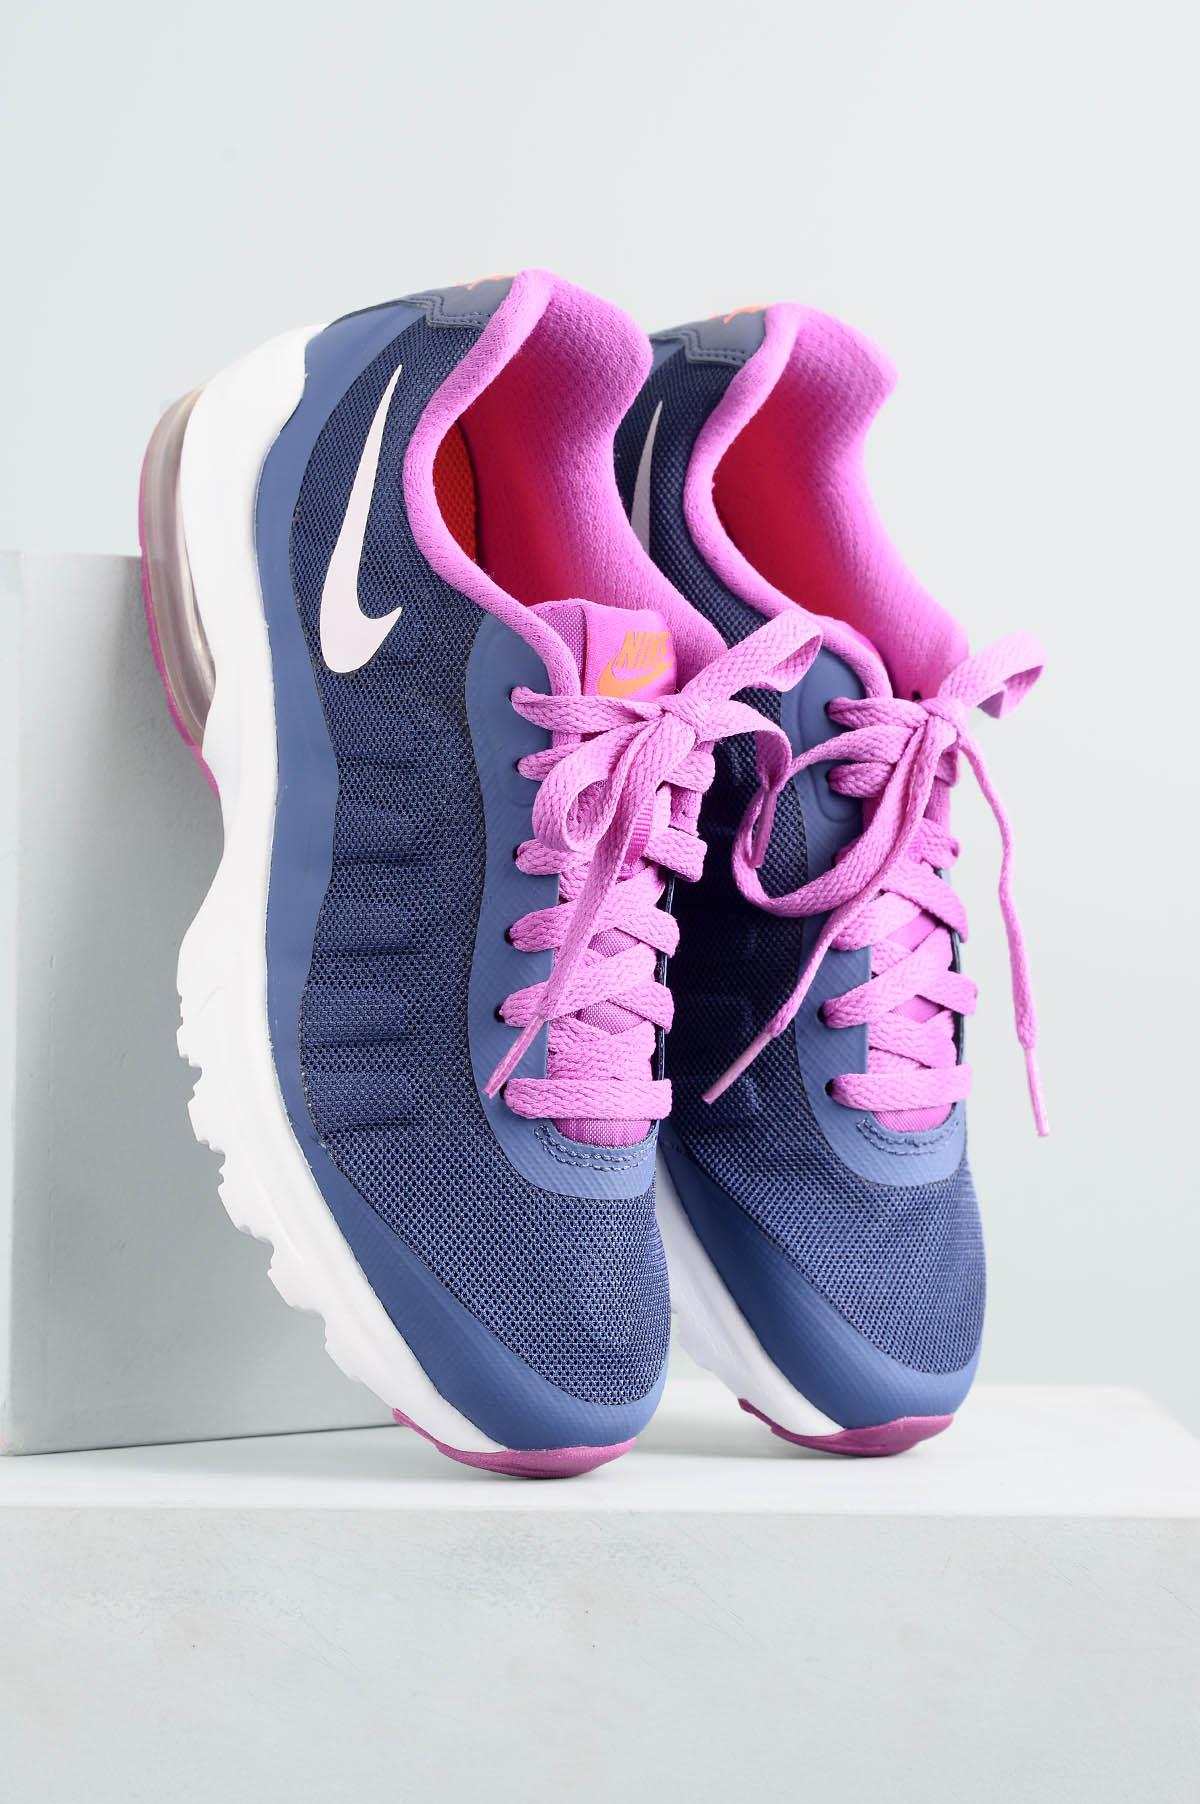 1 Tenis Feminino Nike Invigor TEC ROXO   1 Tenis Feminino Nike Invigor TEC ROXO   1 Tenis Feminino Nike Invigor TEC ROXO. Previous. undefined dcf621dc59